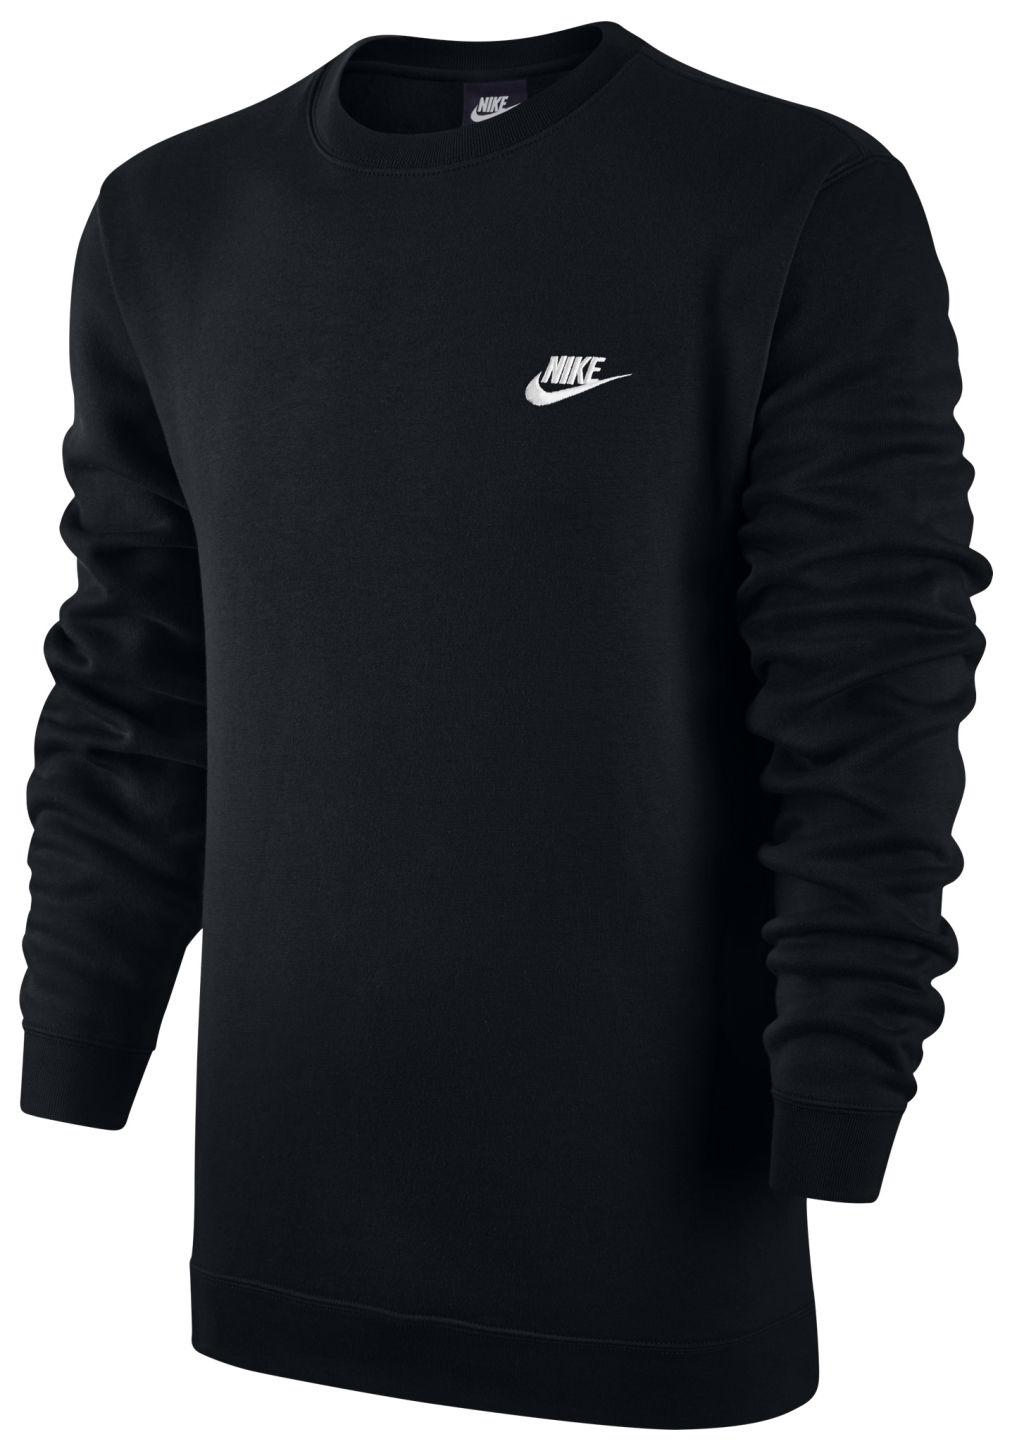 Nike Nsw Crw Flc miesten collegepaita Musta 82f343959d